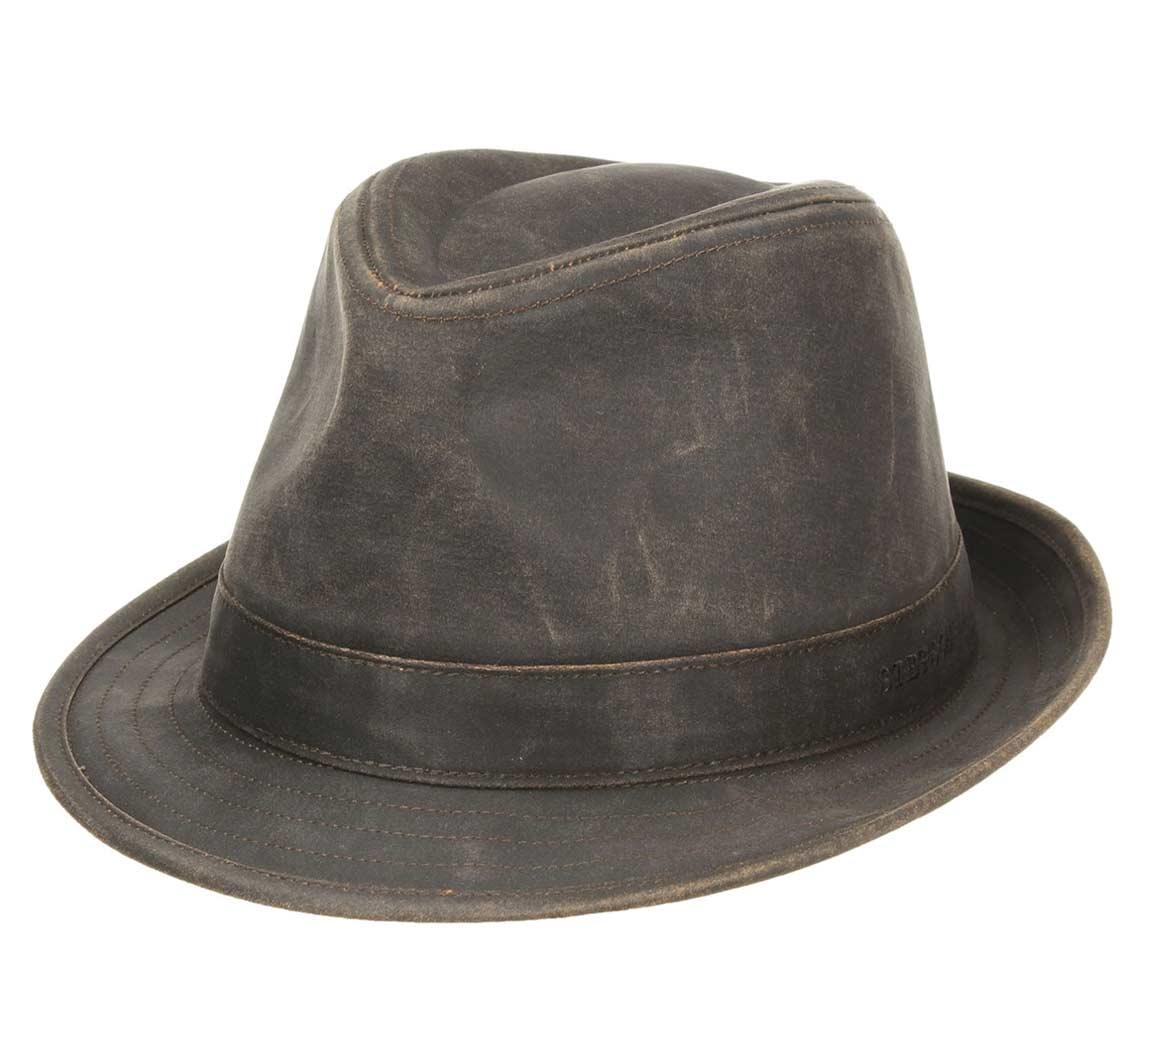 37be8ea283f Odessa - Hats Stetson